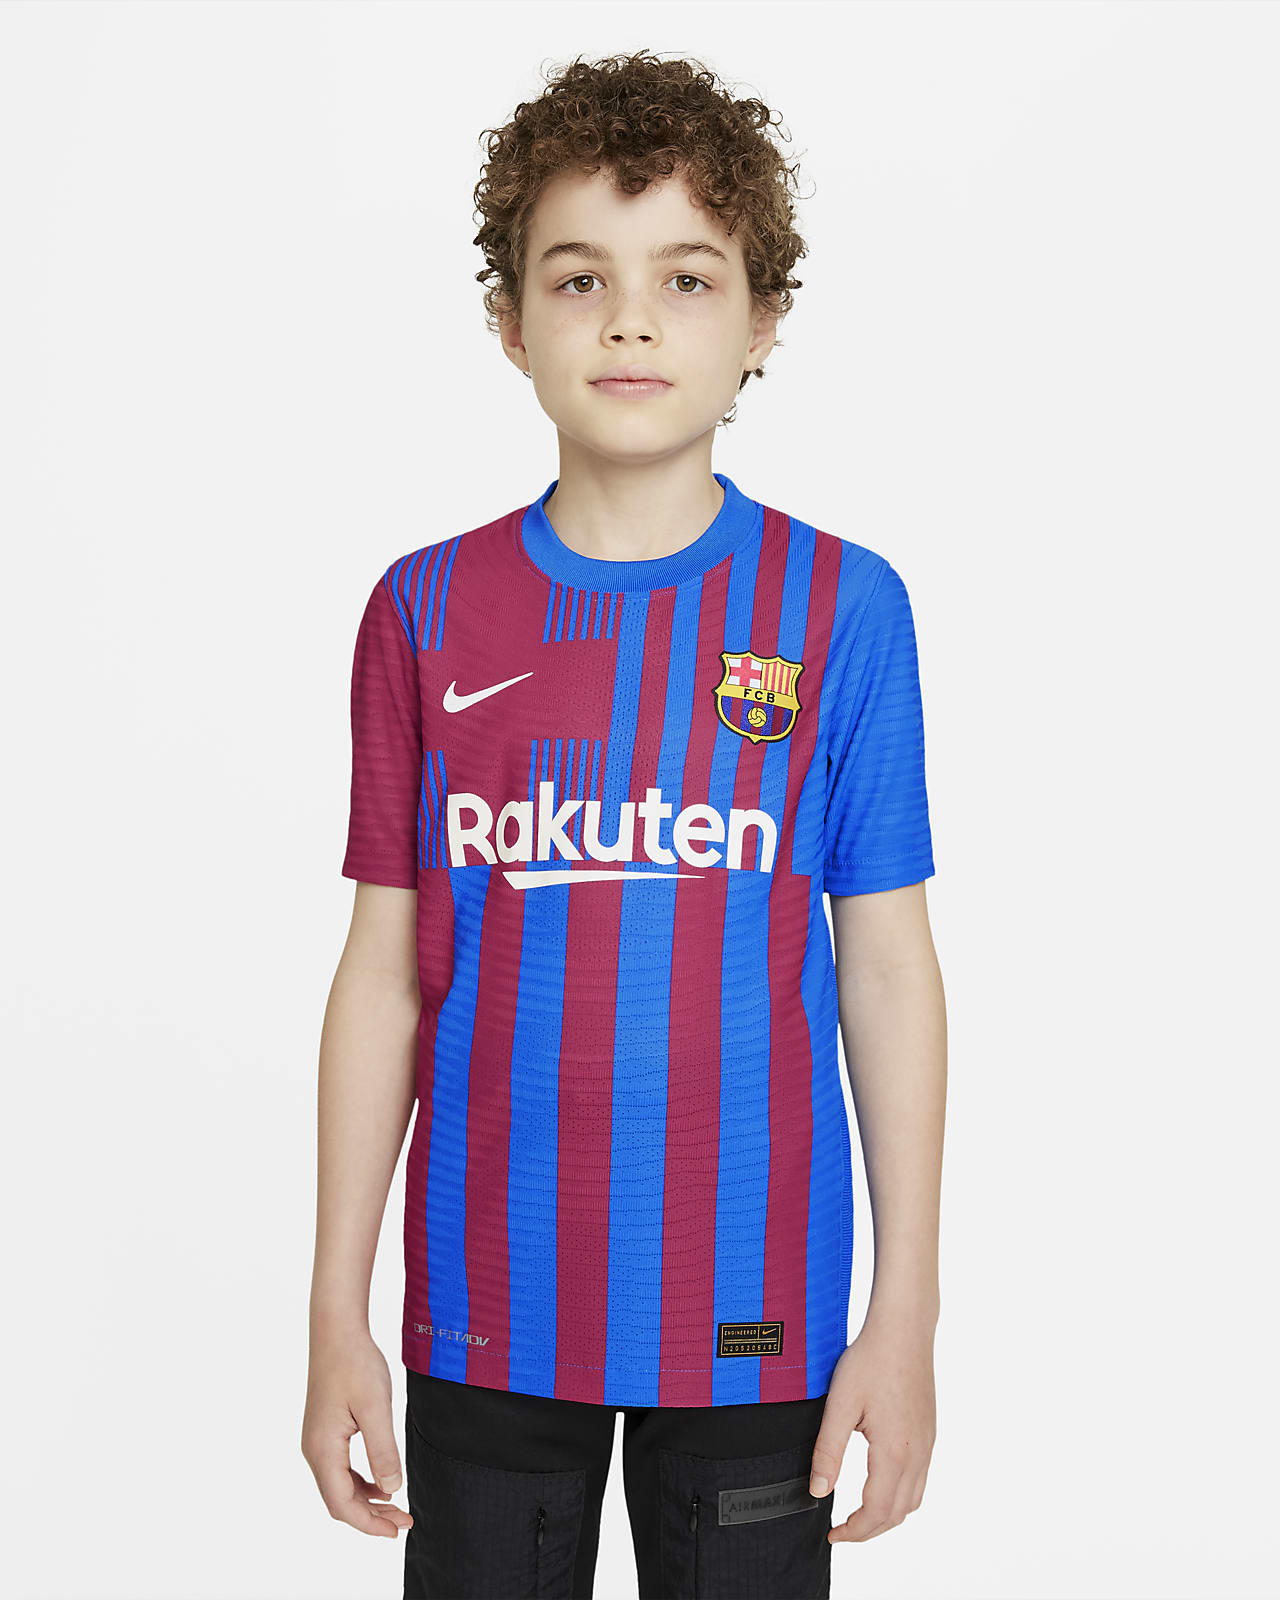 Camiseta de fútbol Nike Dri-FIT ADV para niños talla grande FC Barcelona 2021/22 Match Home